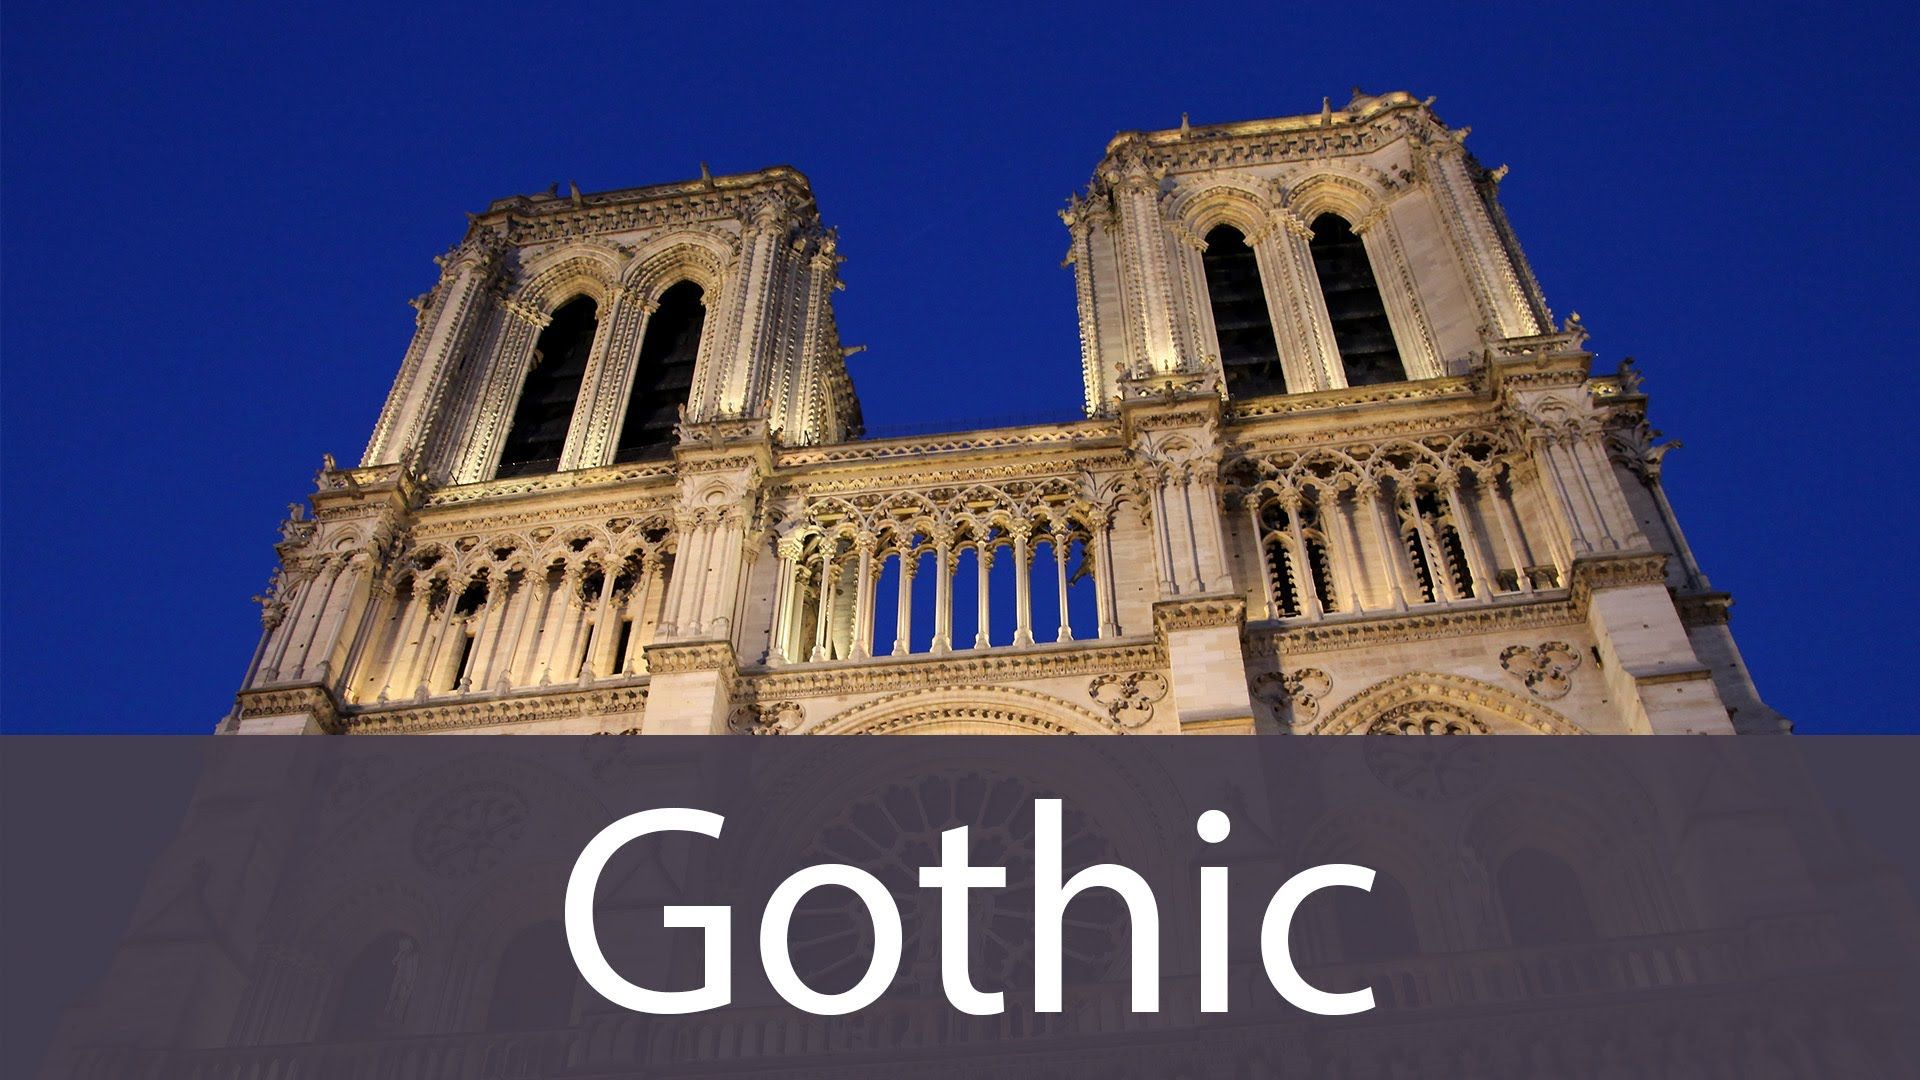 Gothic Art History From Goodbye Art Academy